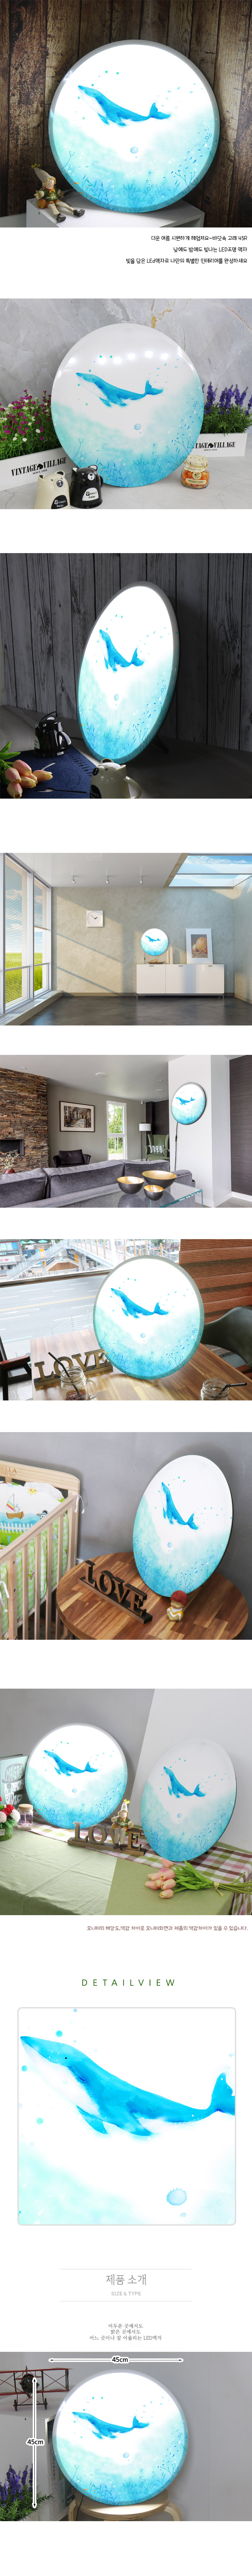 LED액자45R_바닷속고래 - 꾸밈, 86,000원, 포인트조명, 터치조명